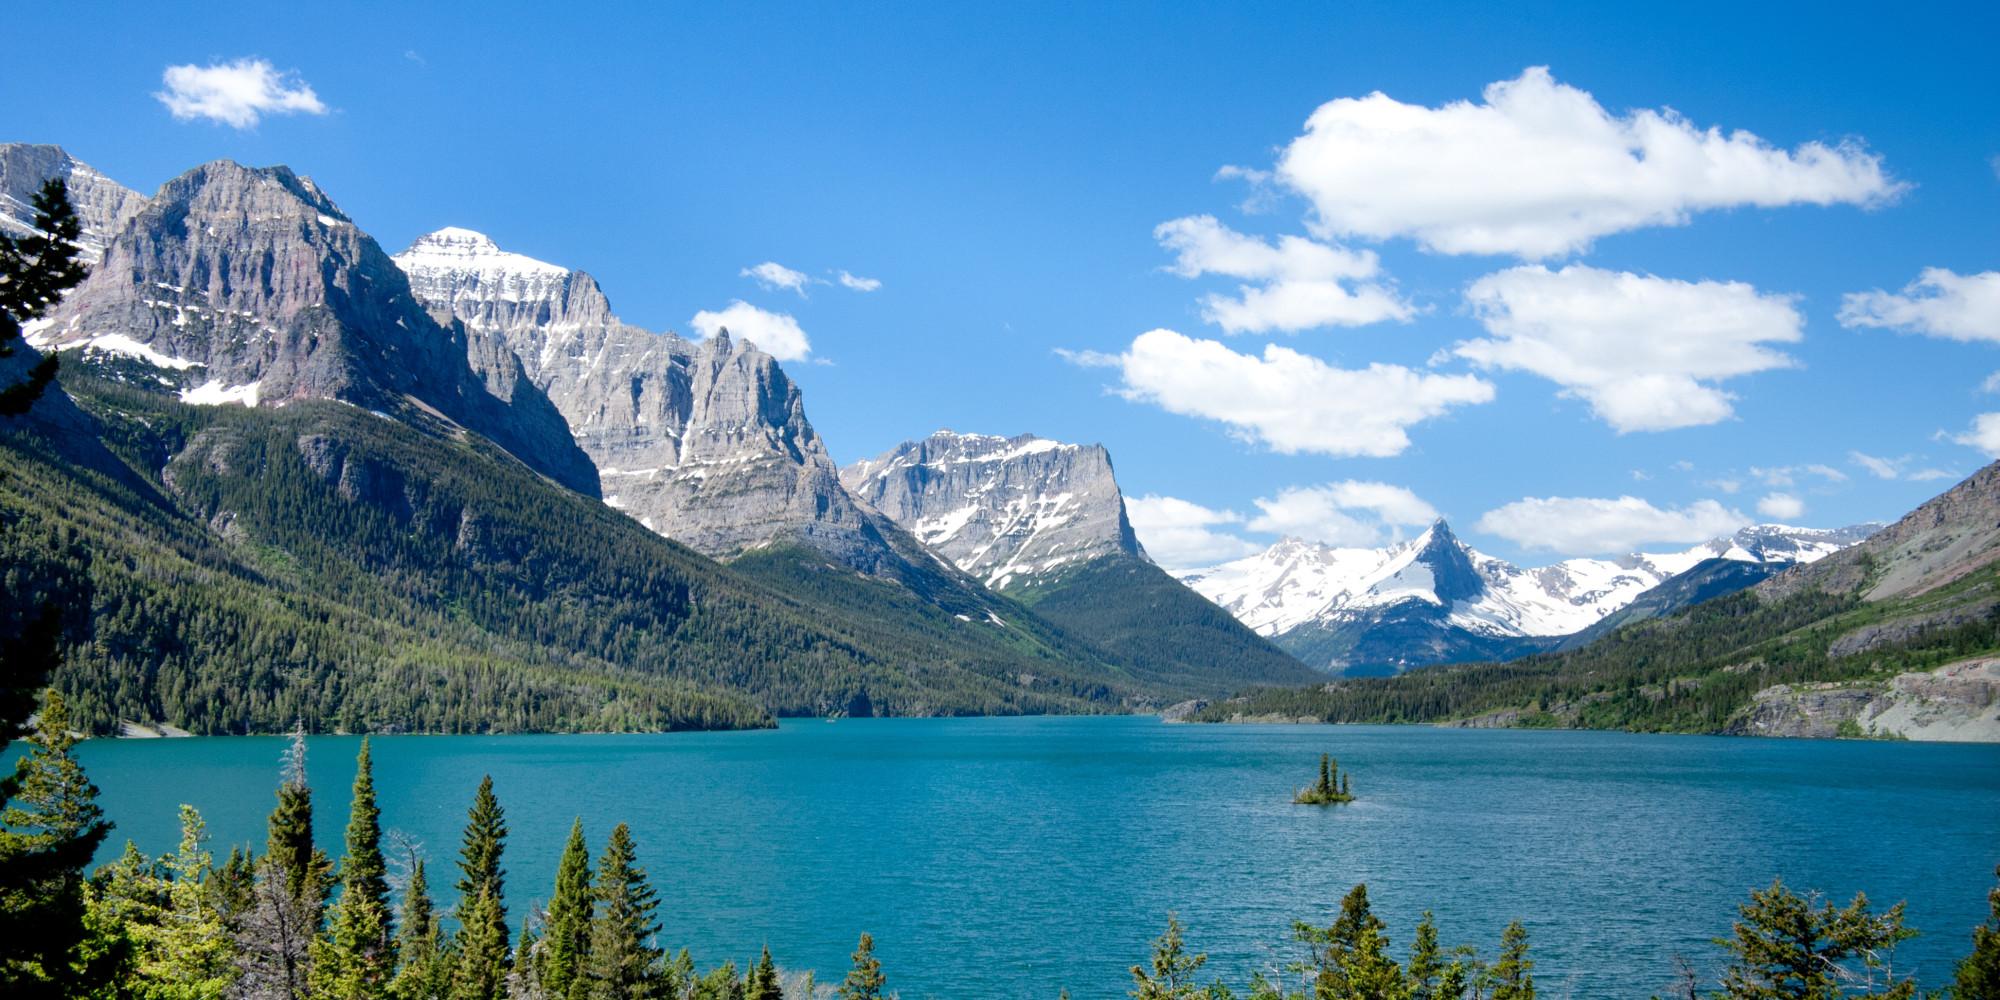 glacier national park photo - photo #47